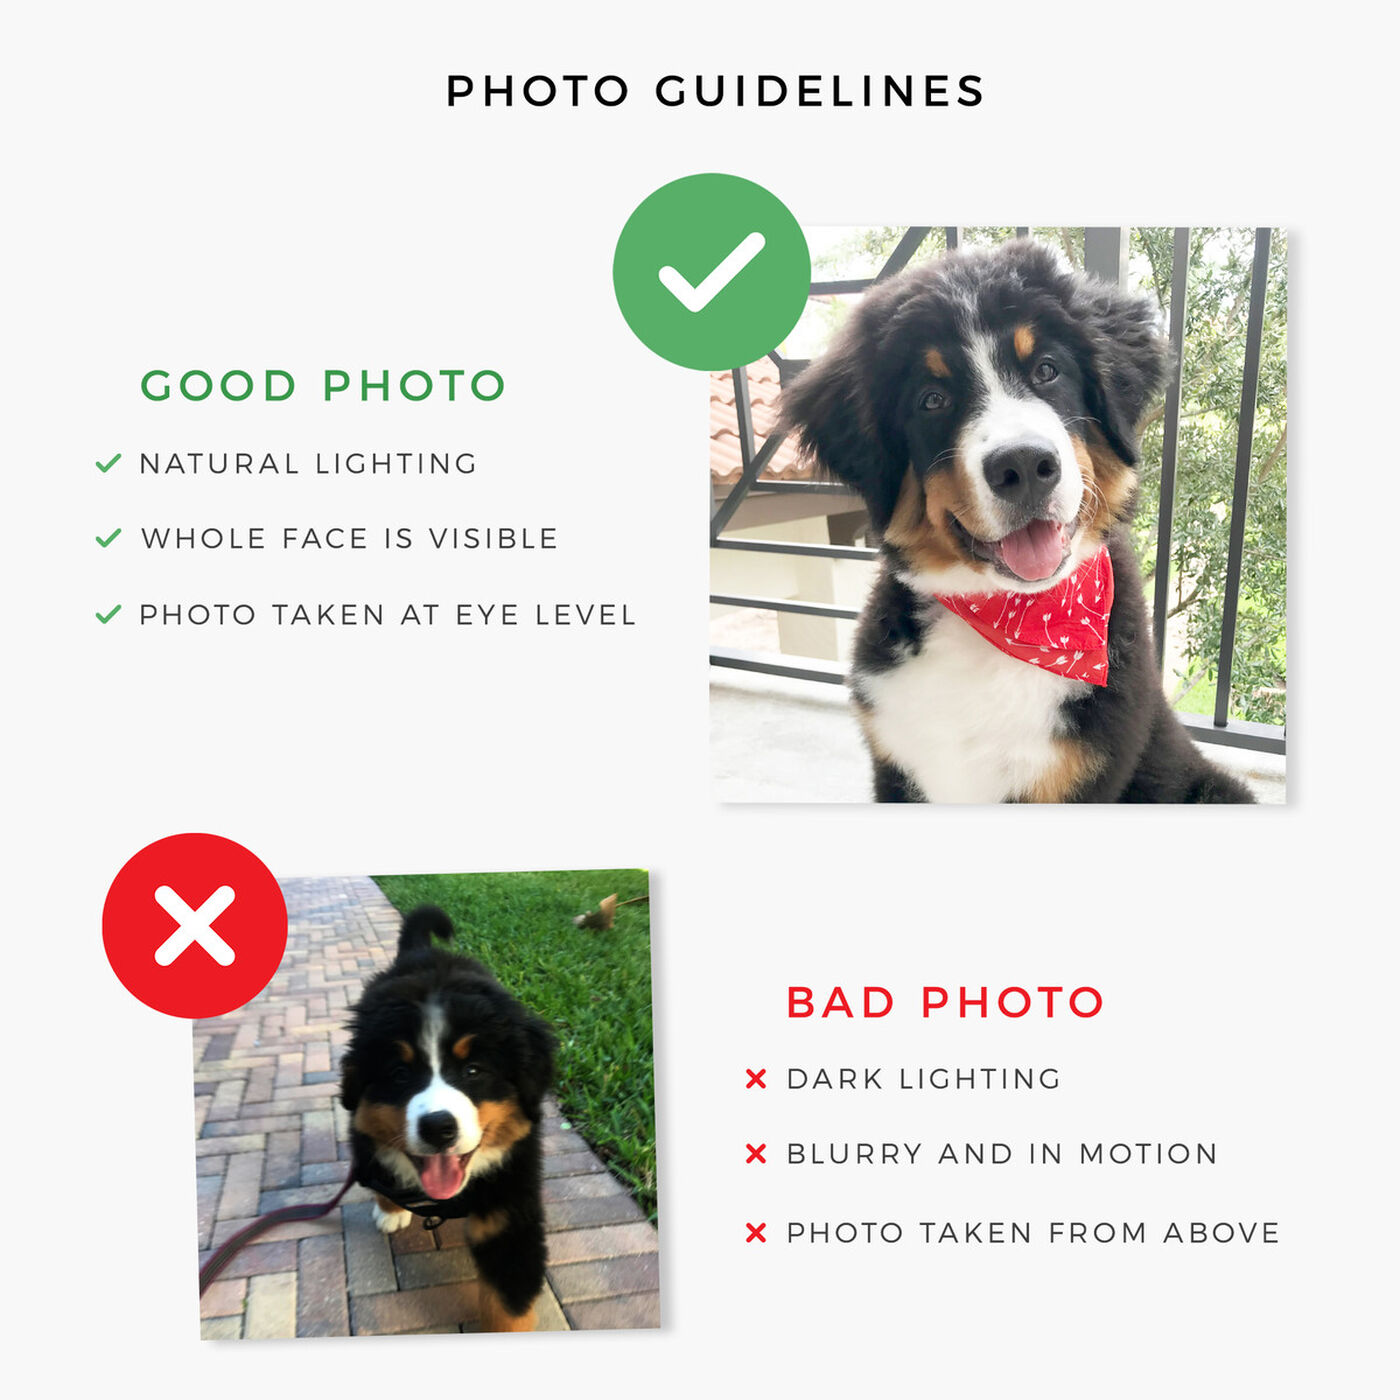 Pet photo guidelines.